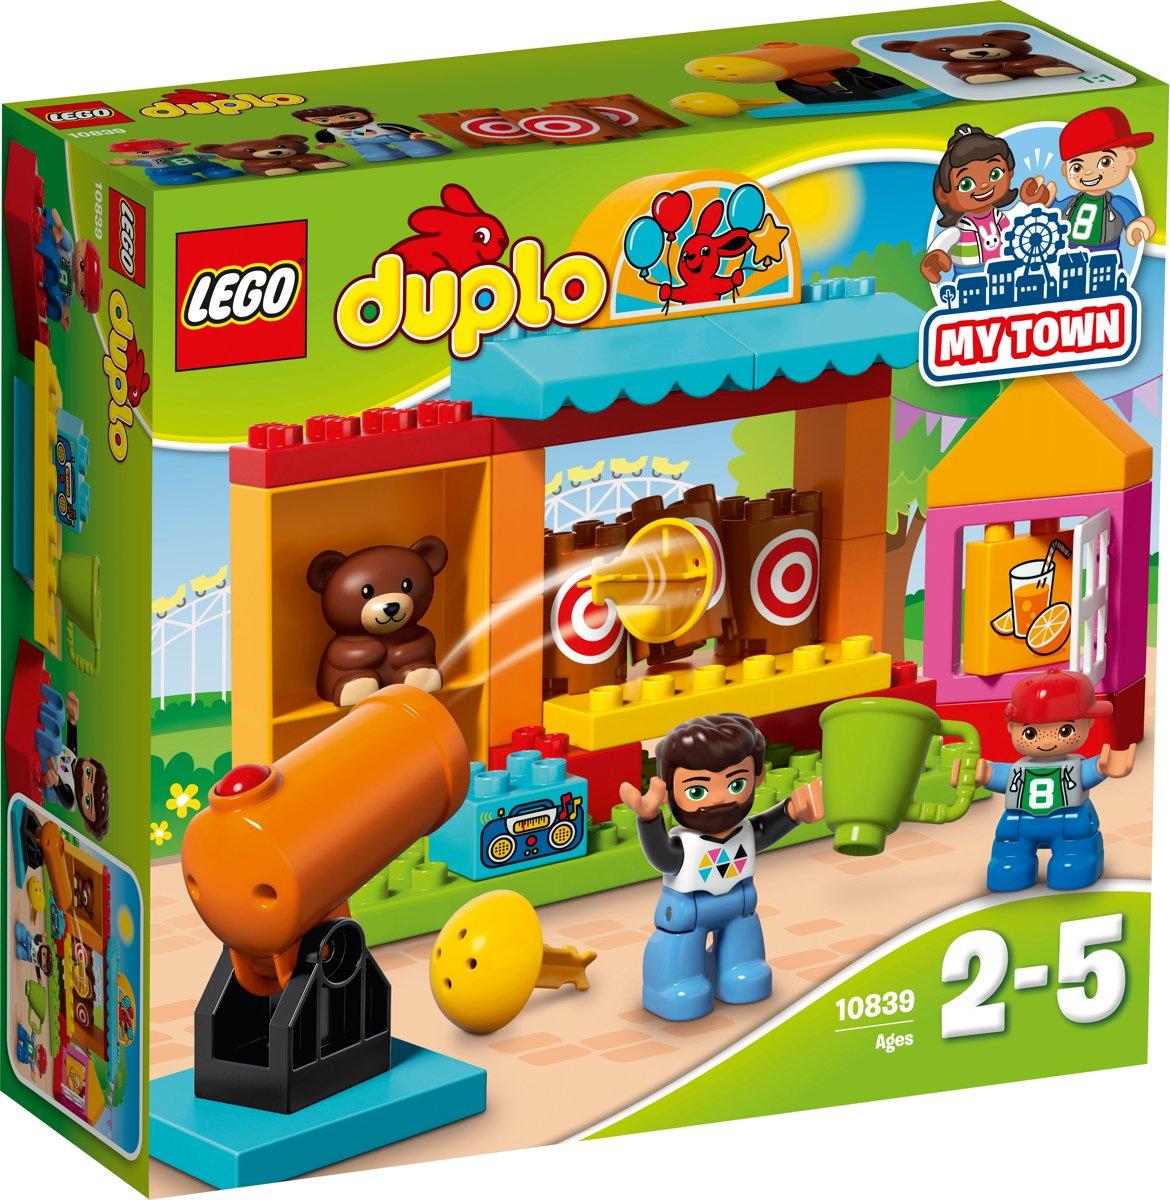 10839 Lego Duplo Schiettent